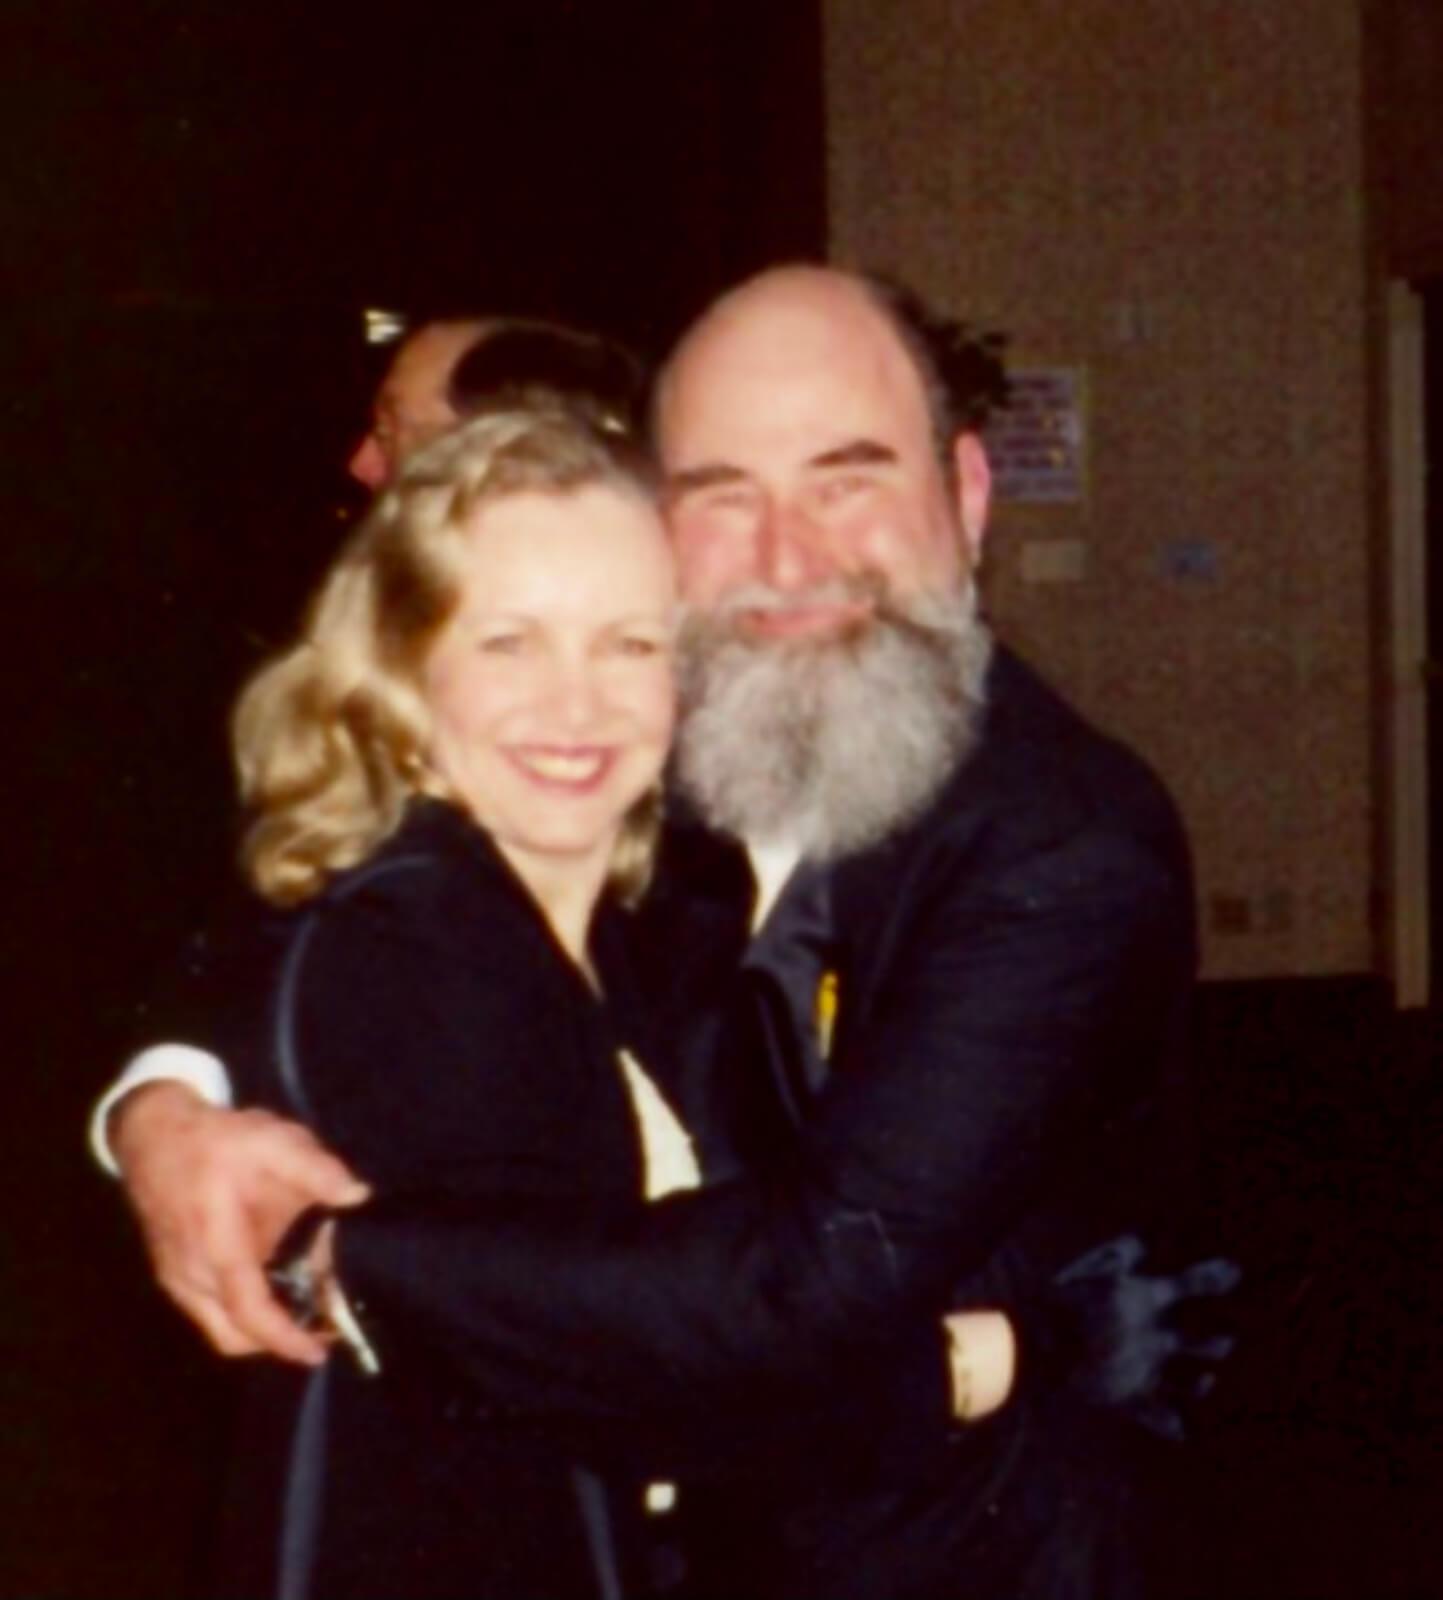 Susan Stroman with Michael David, both elegantly dressed and hugging, on Opening Night.